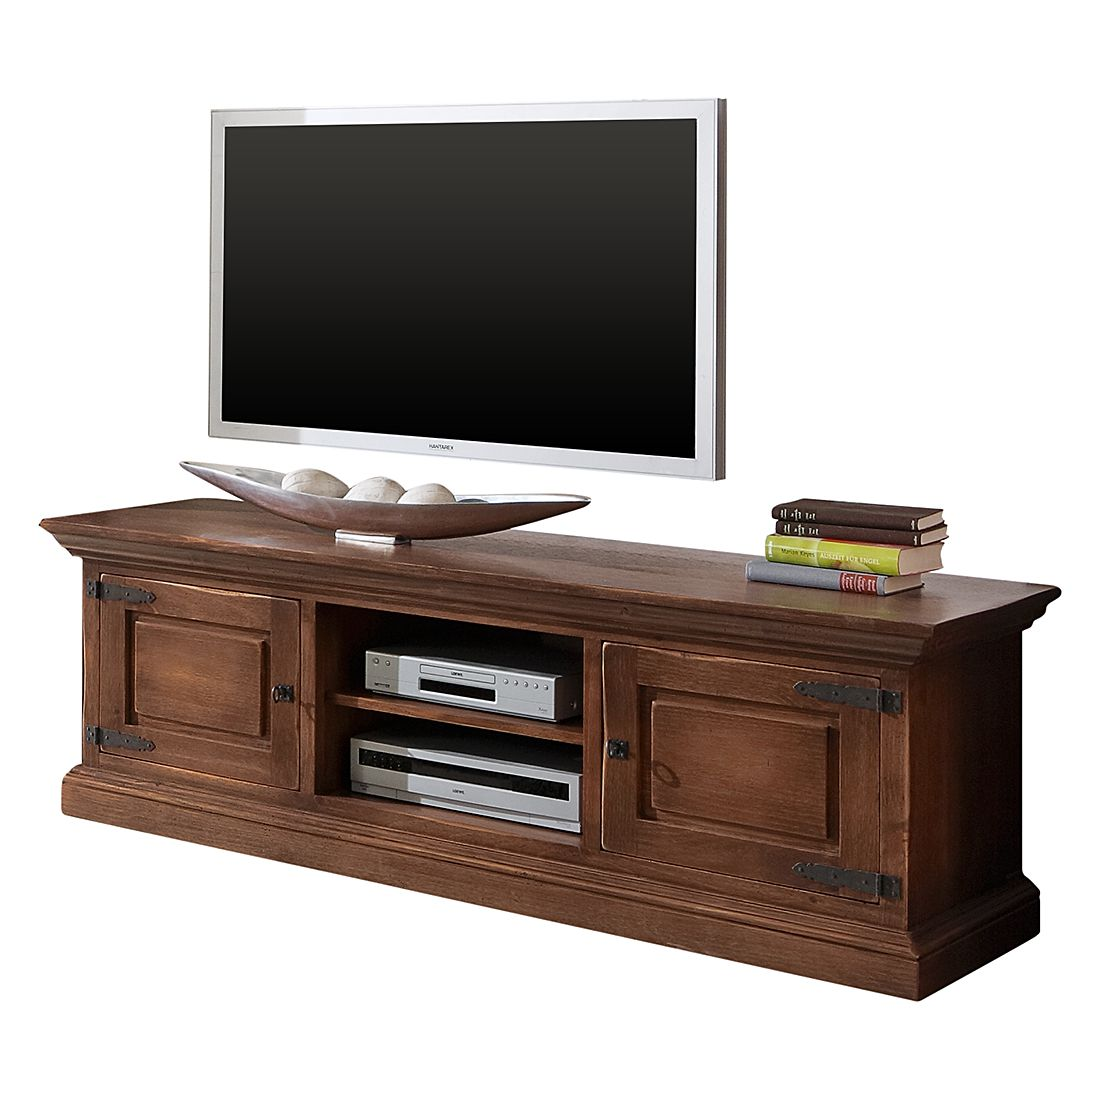 tv lowboard vicuna pinie massiv braun landhaus classic g nstig. Black Bedroom Furniture Sets. Home Design Ideas